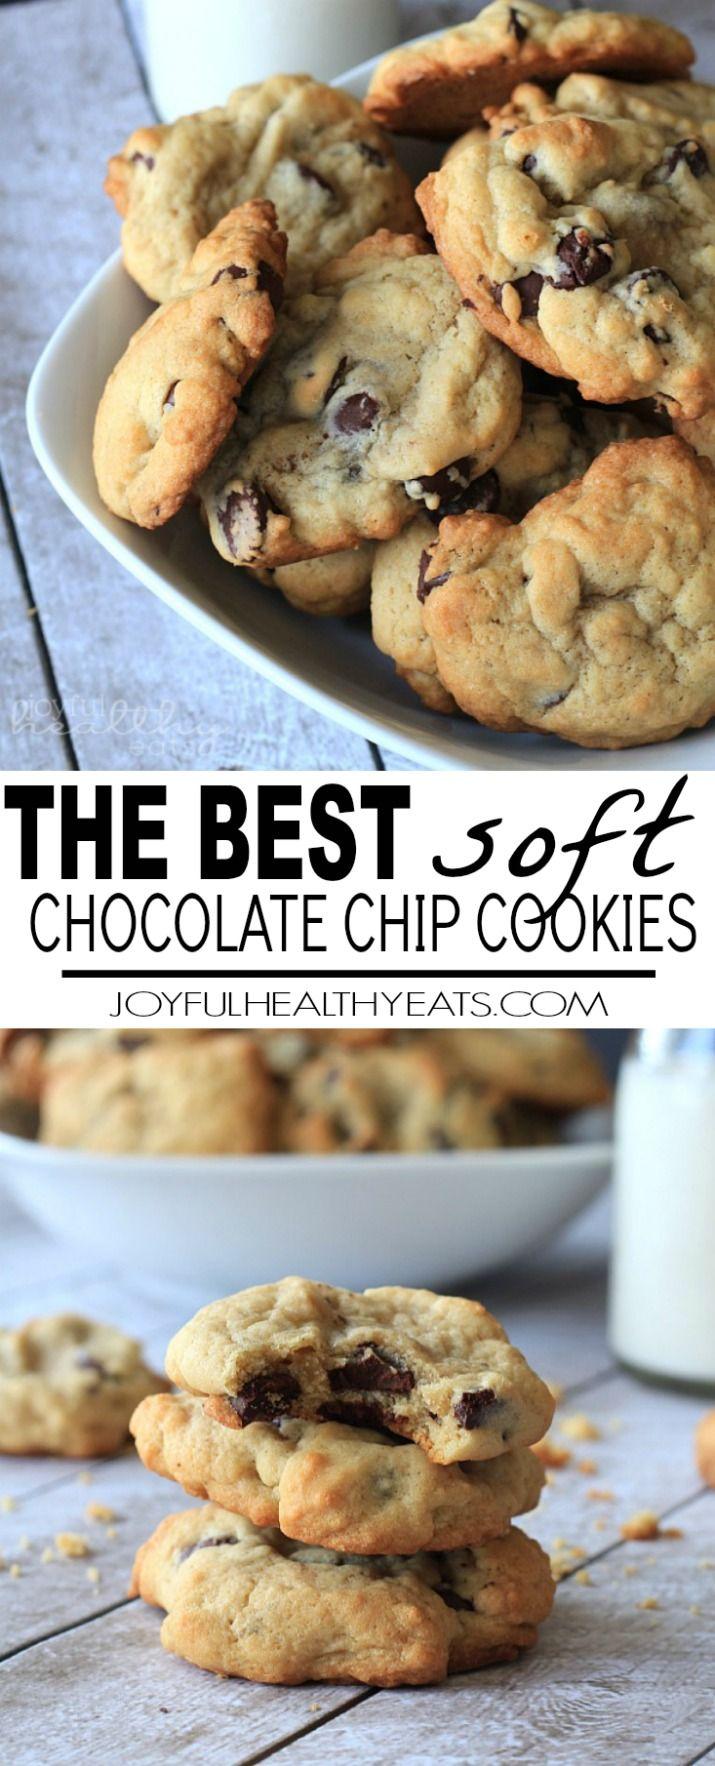 Best 25+ Soft chocolate chip cookies ideas on Pinterest ...